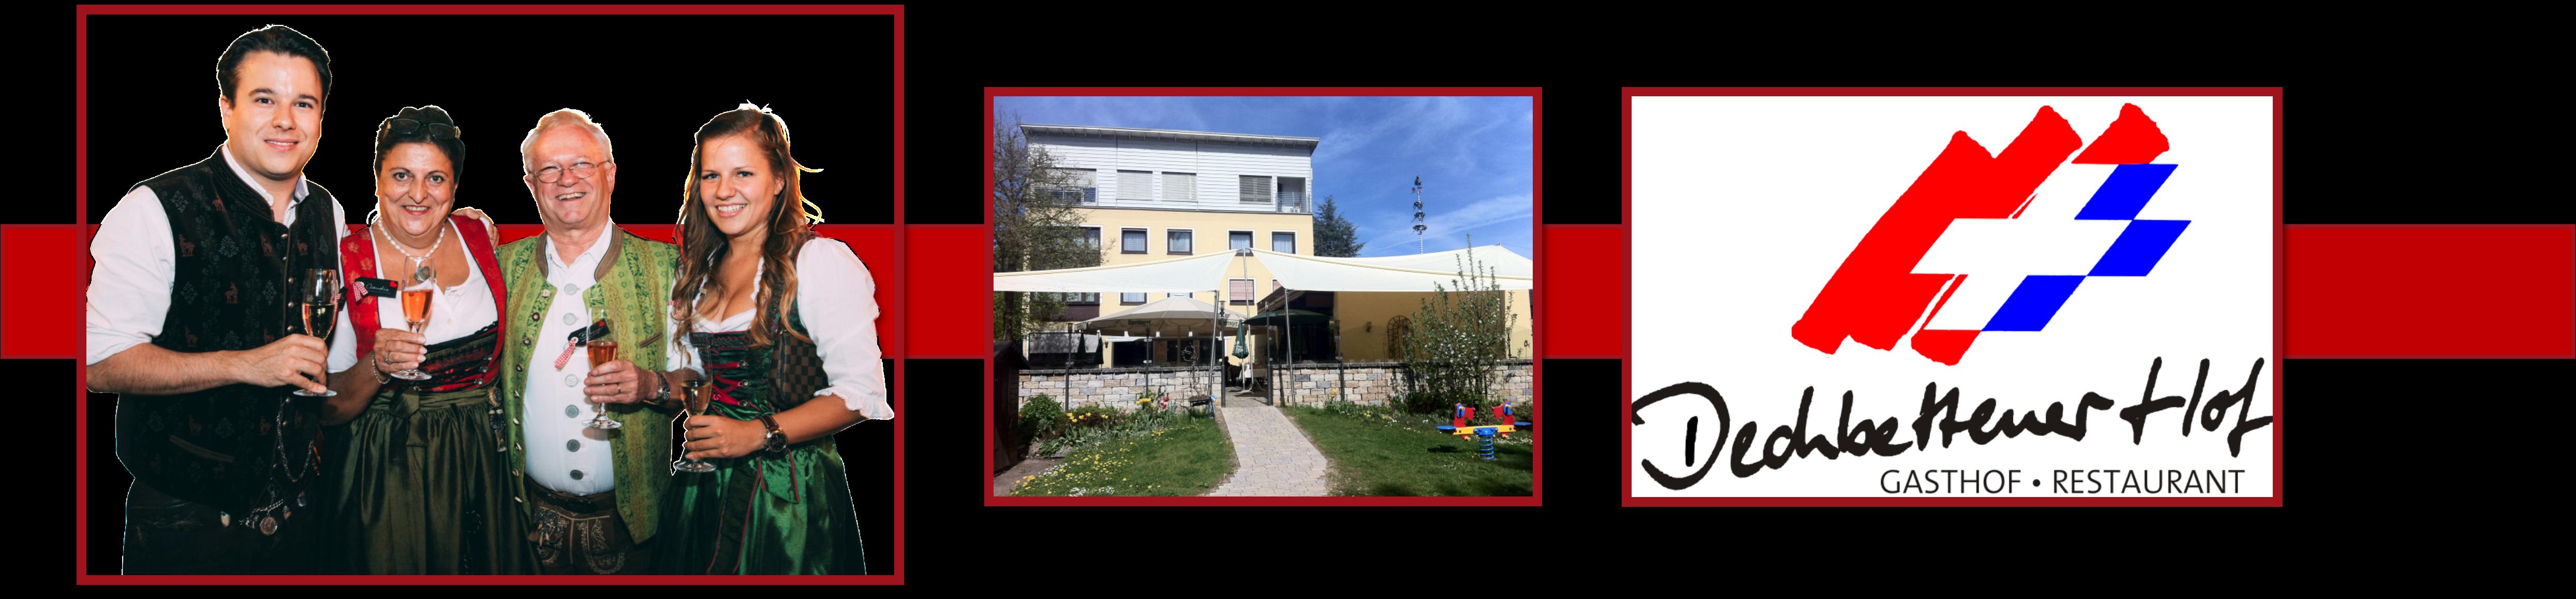 Hotel-Restaurant Dechbettener Hof